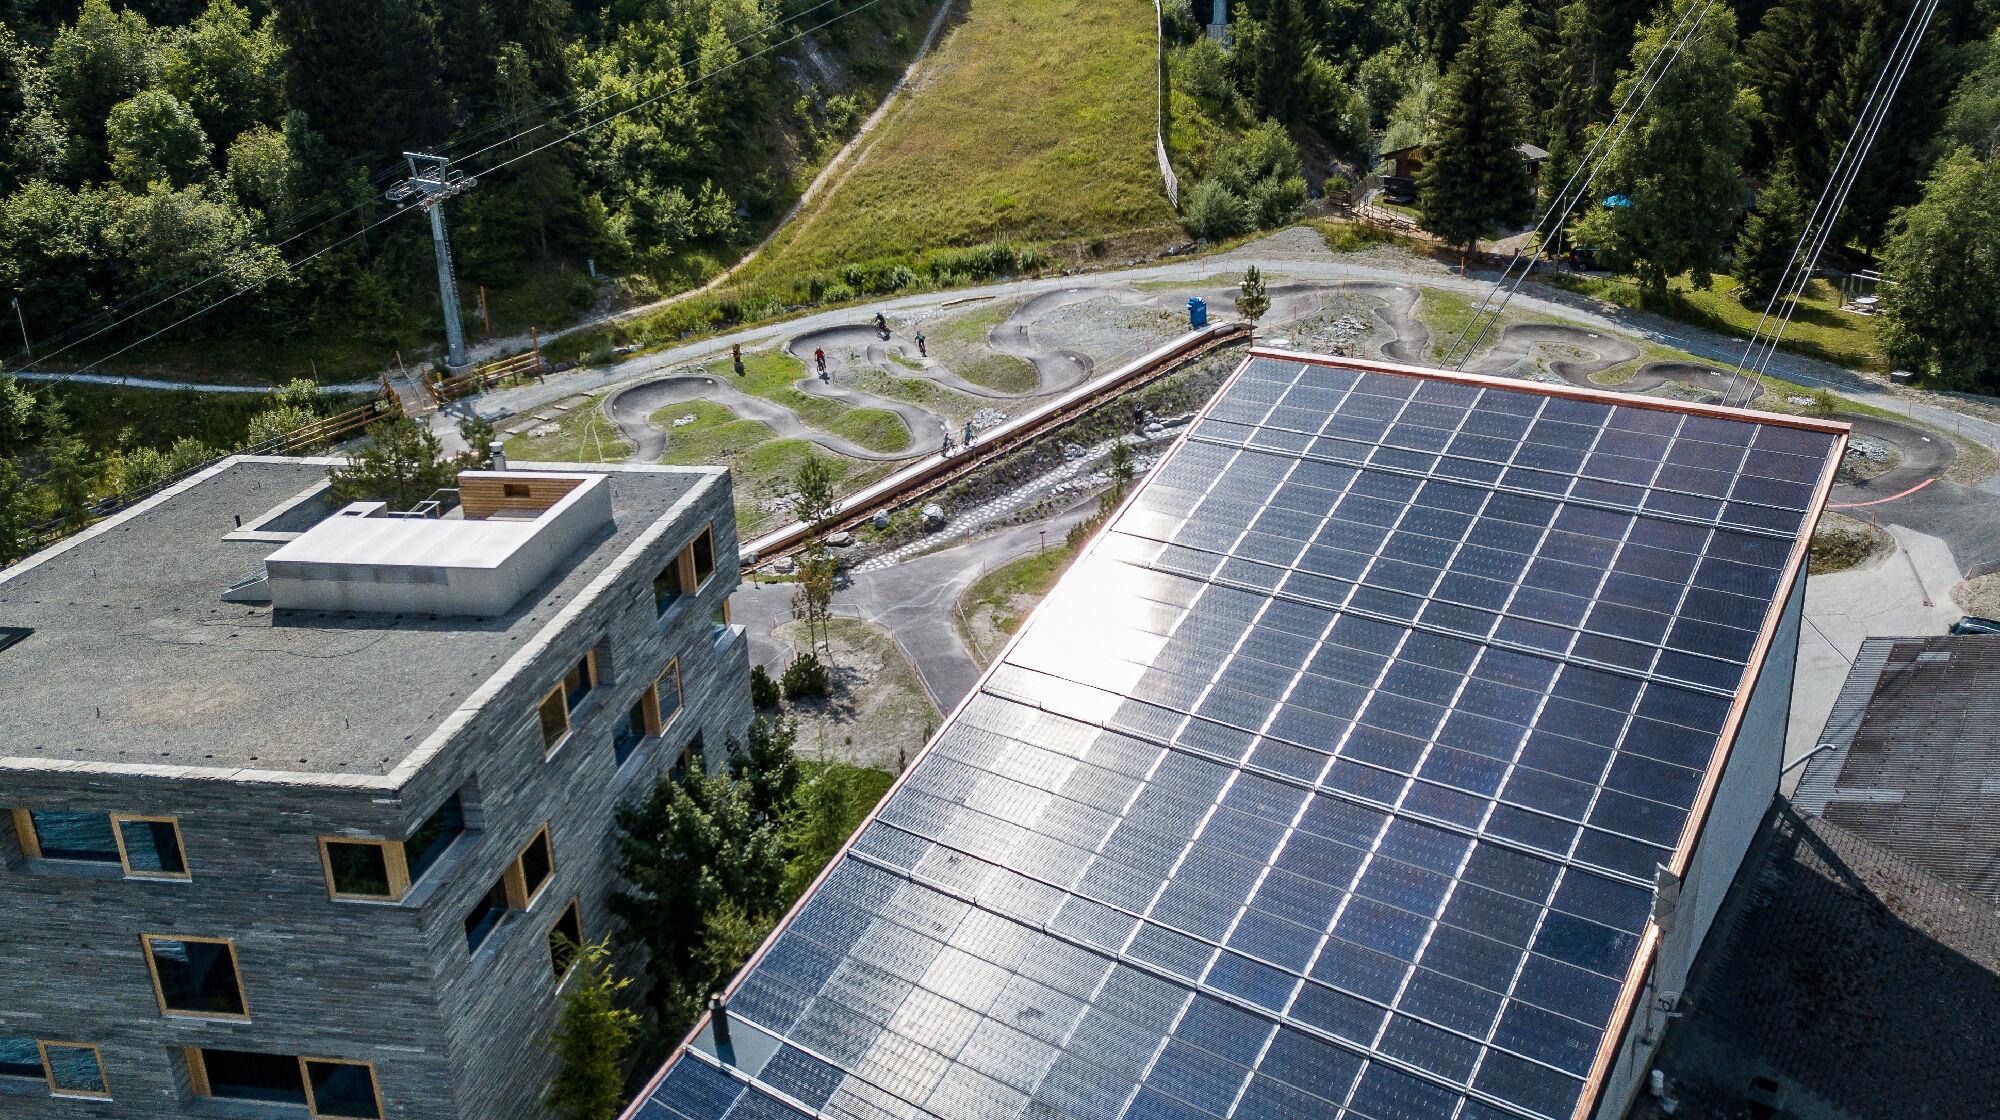 Talstation Grap Sogn mit Solarpanels